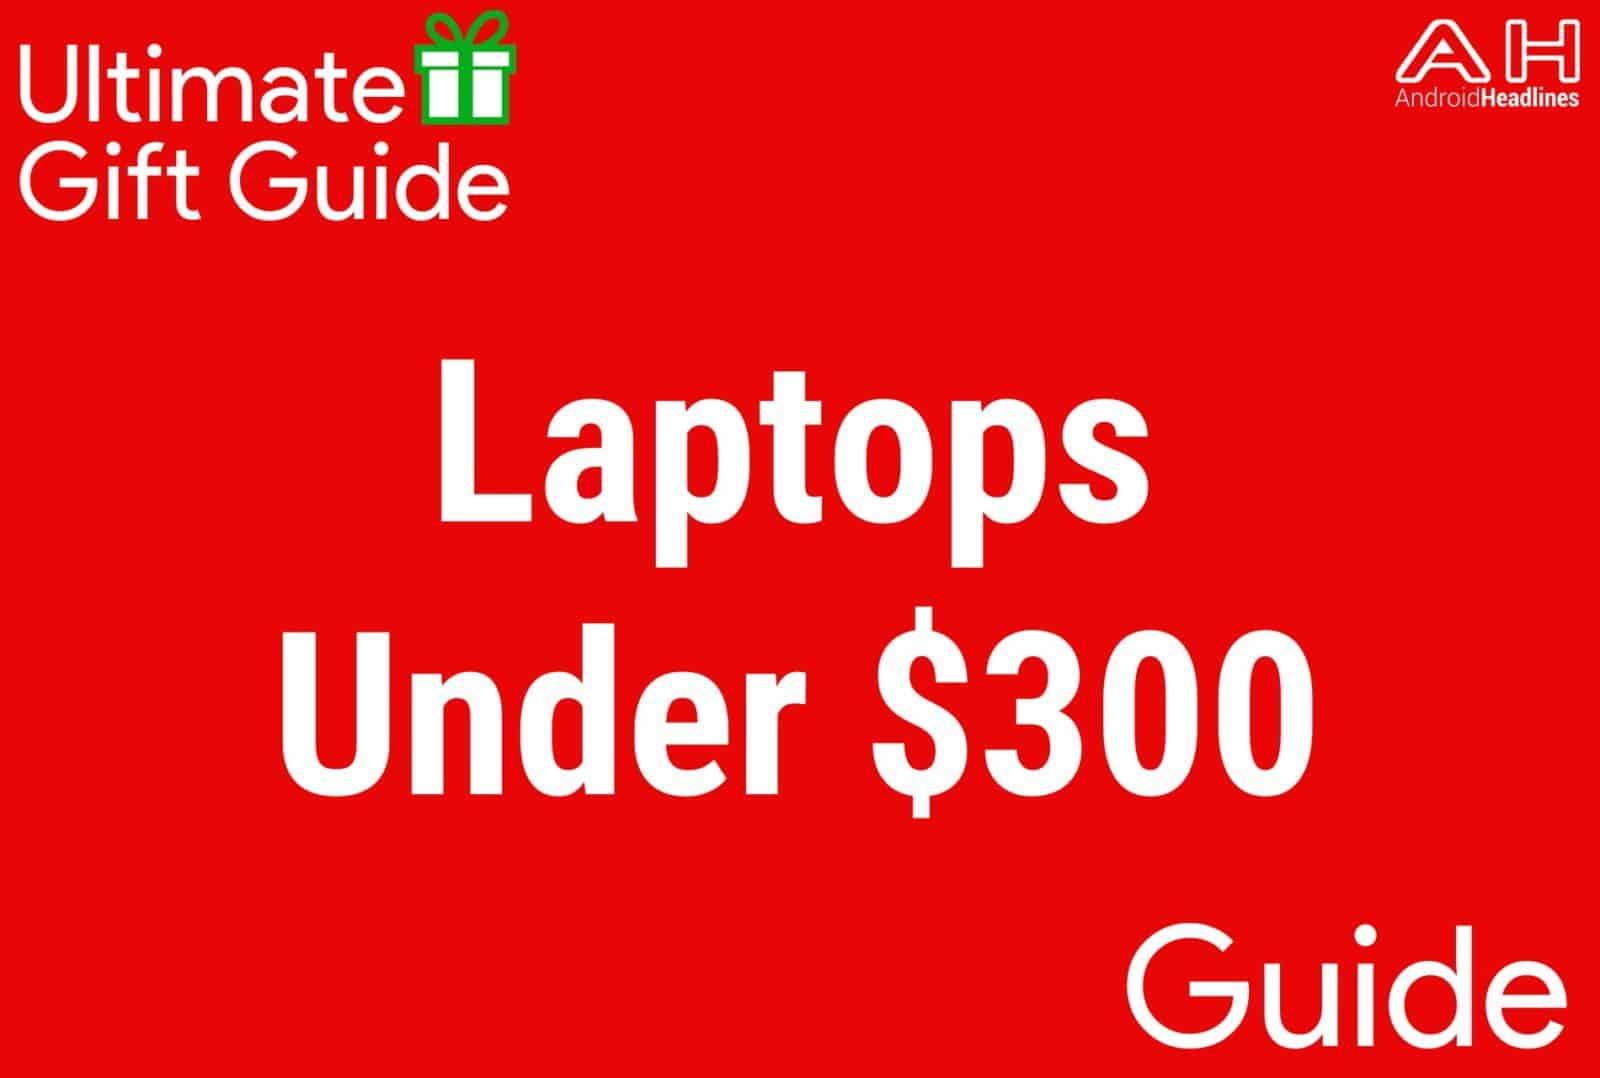 Laptops Under $300 - Gift Guide 2015